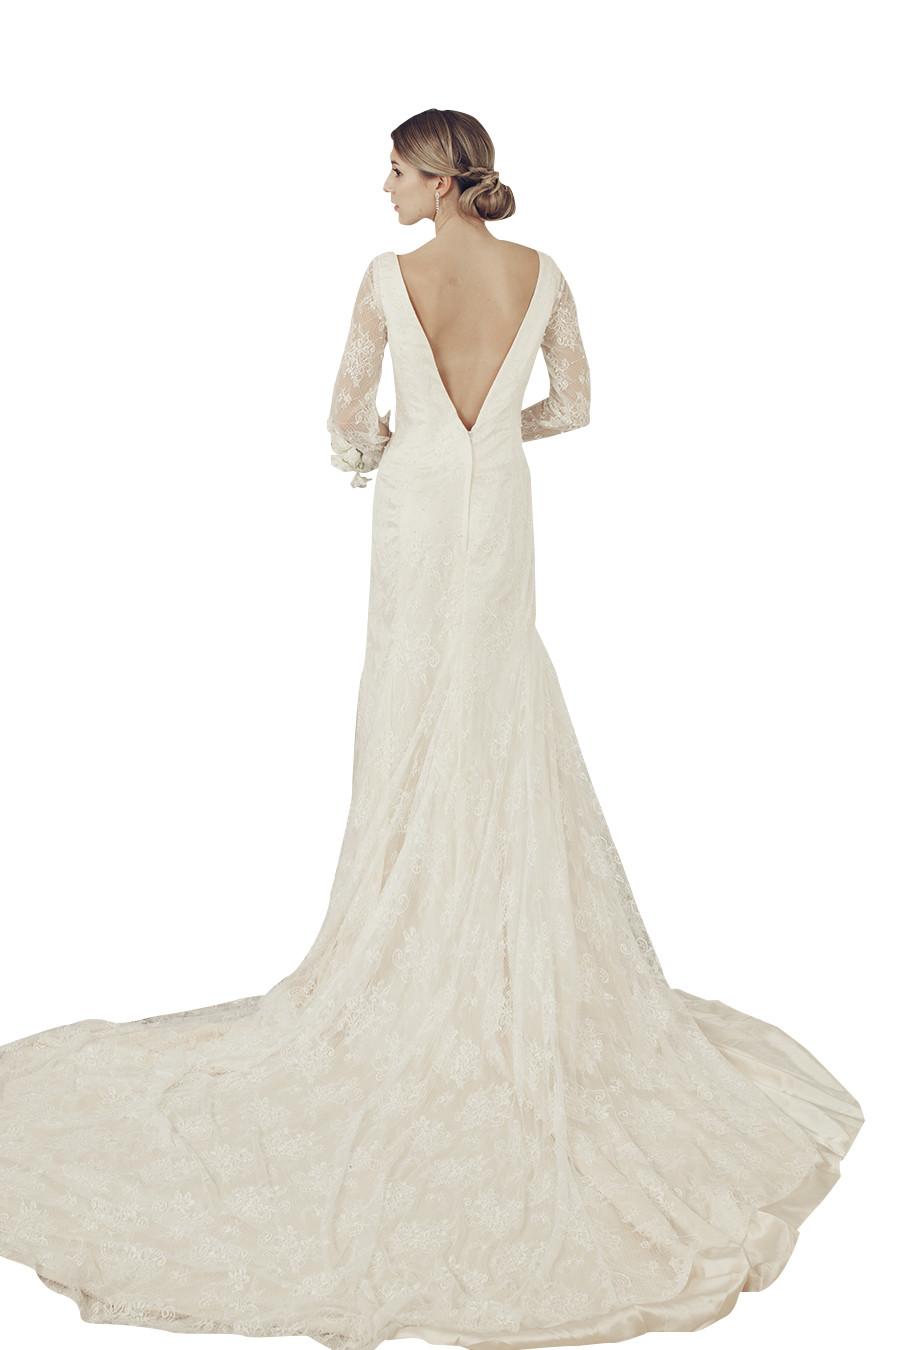 Beige long sleeve wedding dress (45679)